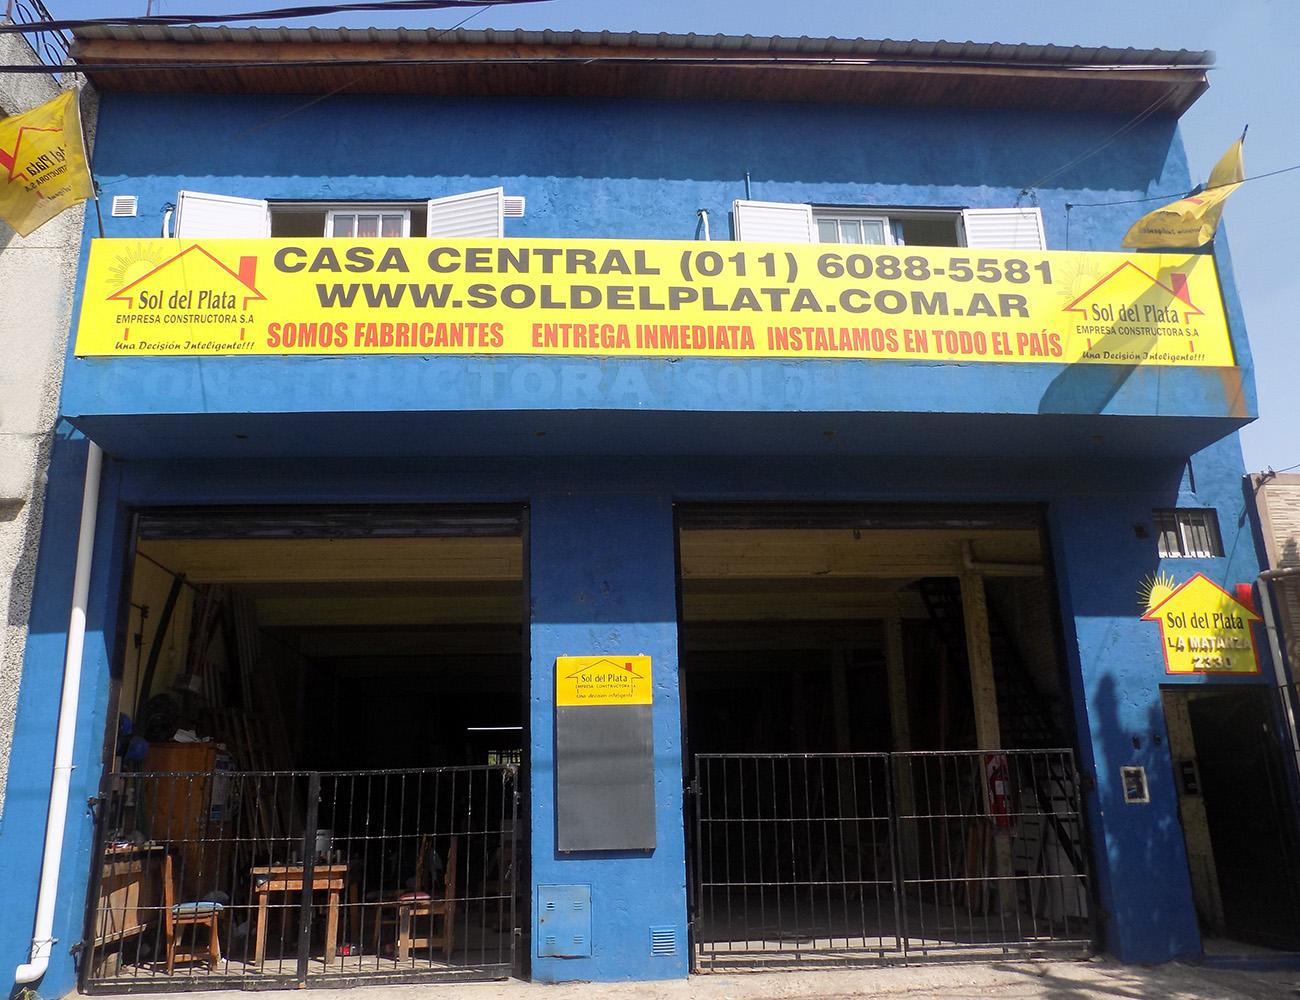 Planta Industrial - Constructora Sol del Plata